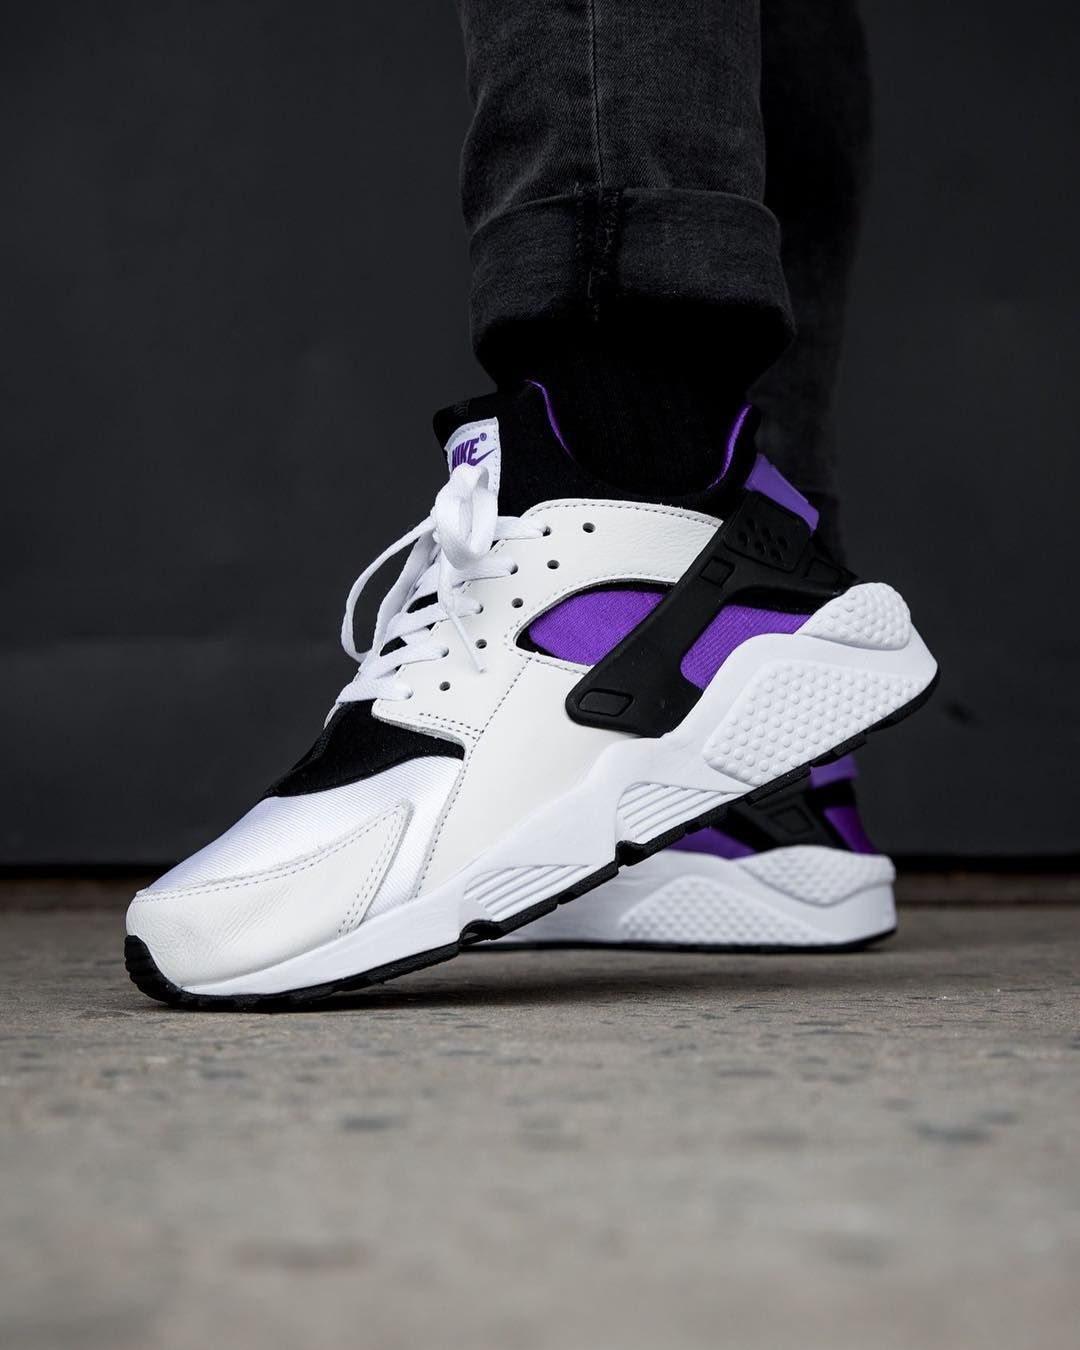 meet 7ad26 dfb77 ... Credit 43einhalb Nike Inside Sneakers  Release Date March 1, 2018 Nike  Air Huarache Run 91 White Purple ...